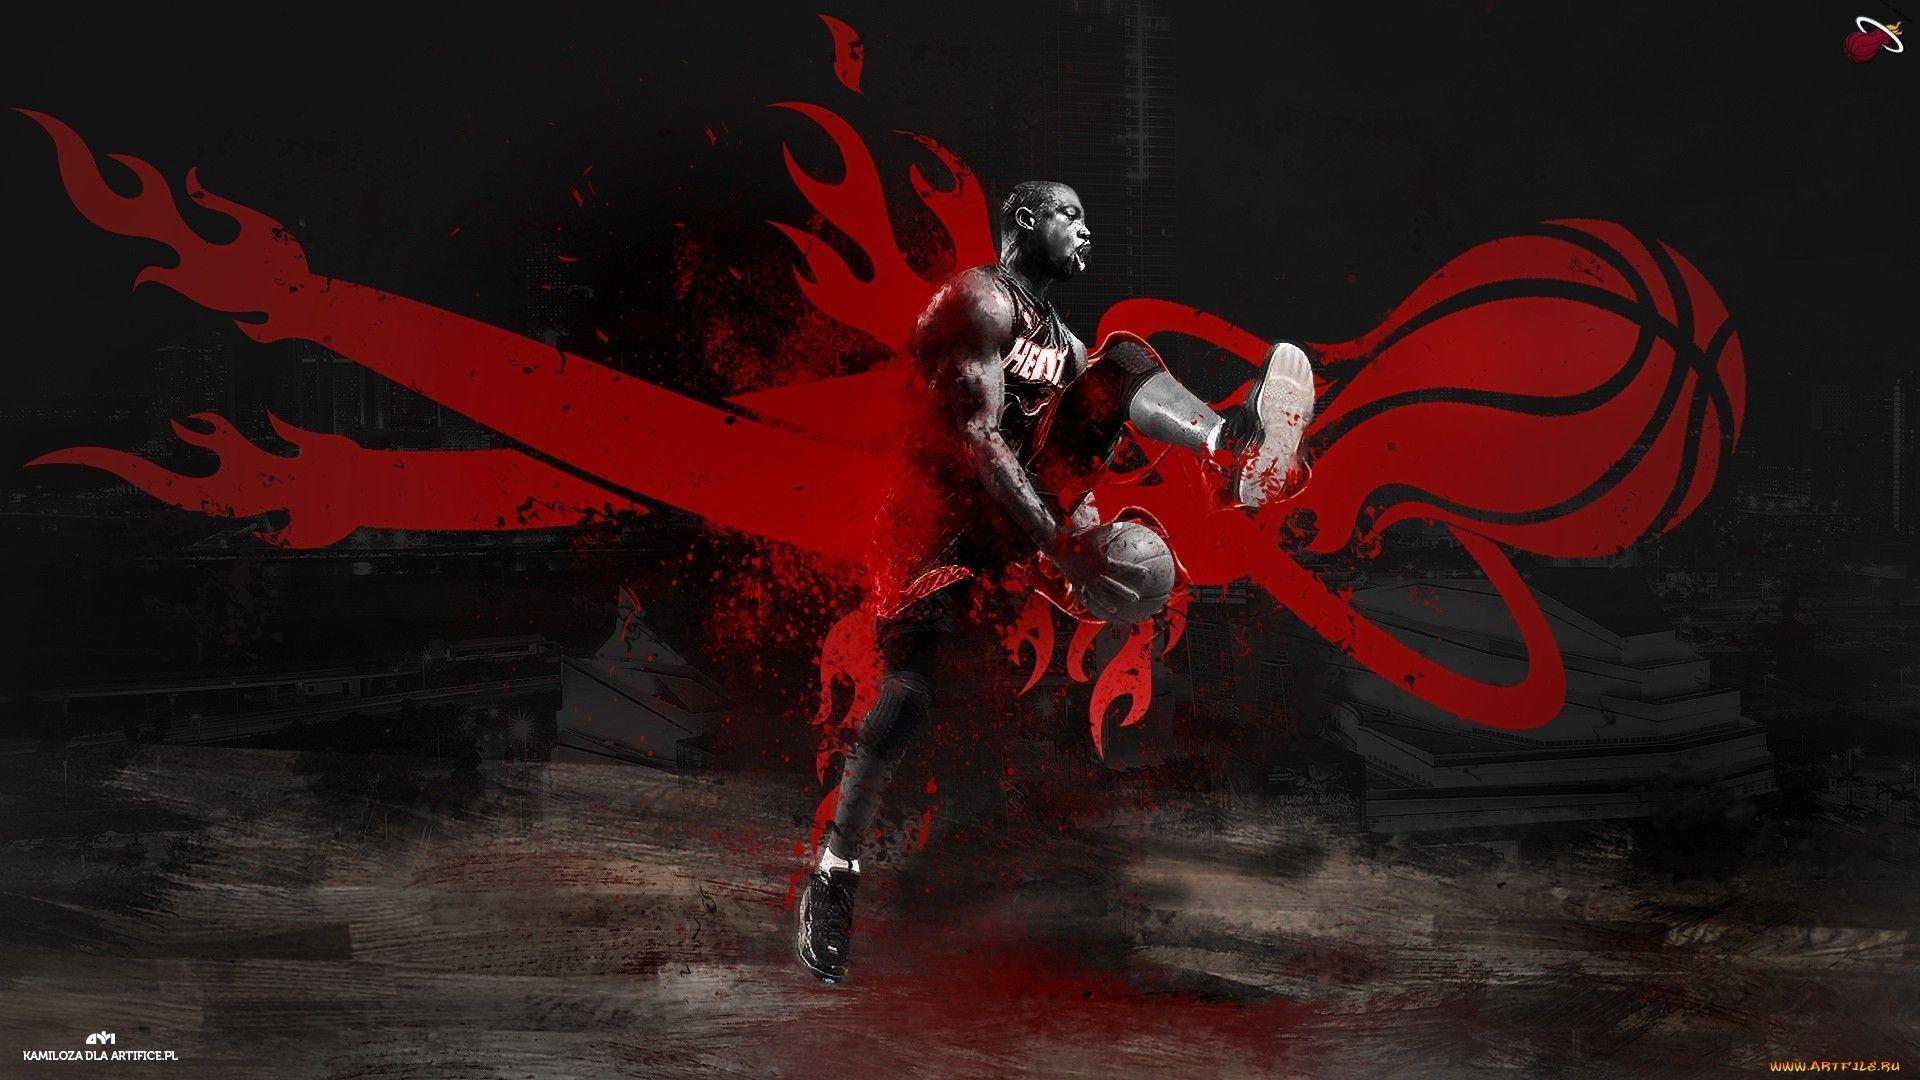 nba_basketball_1920x1080_64362.jpg 1,920×1,080 pixels